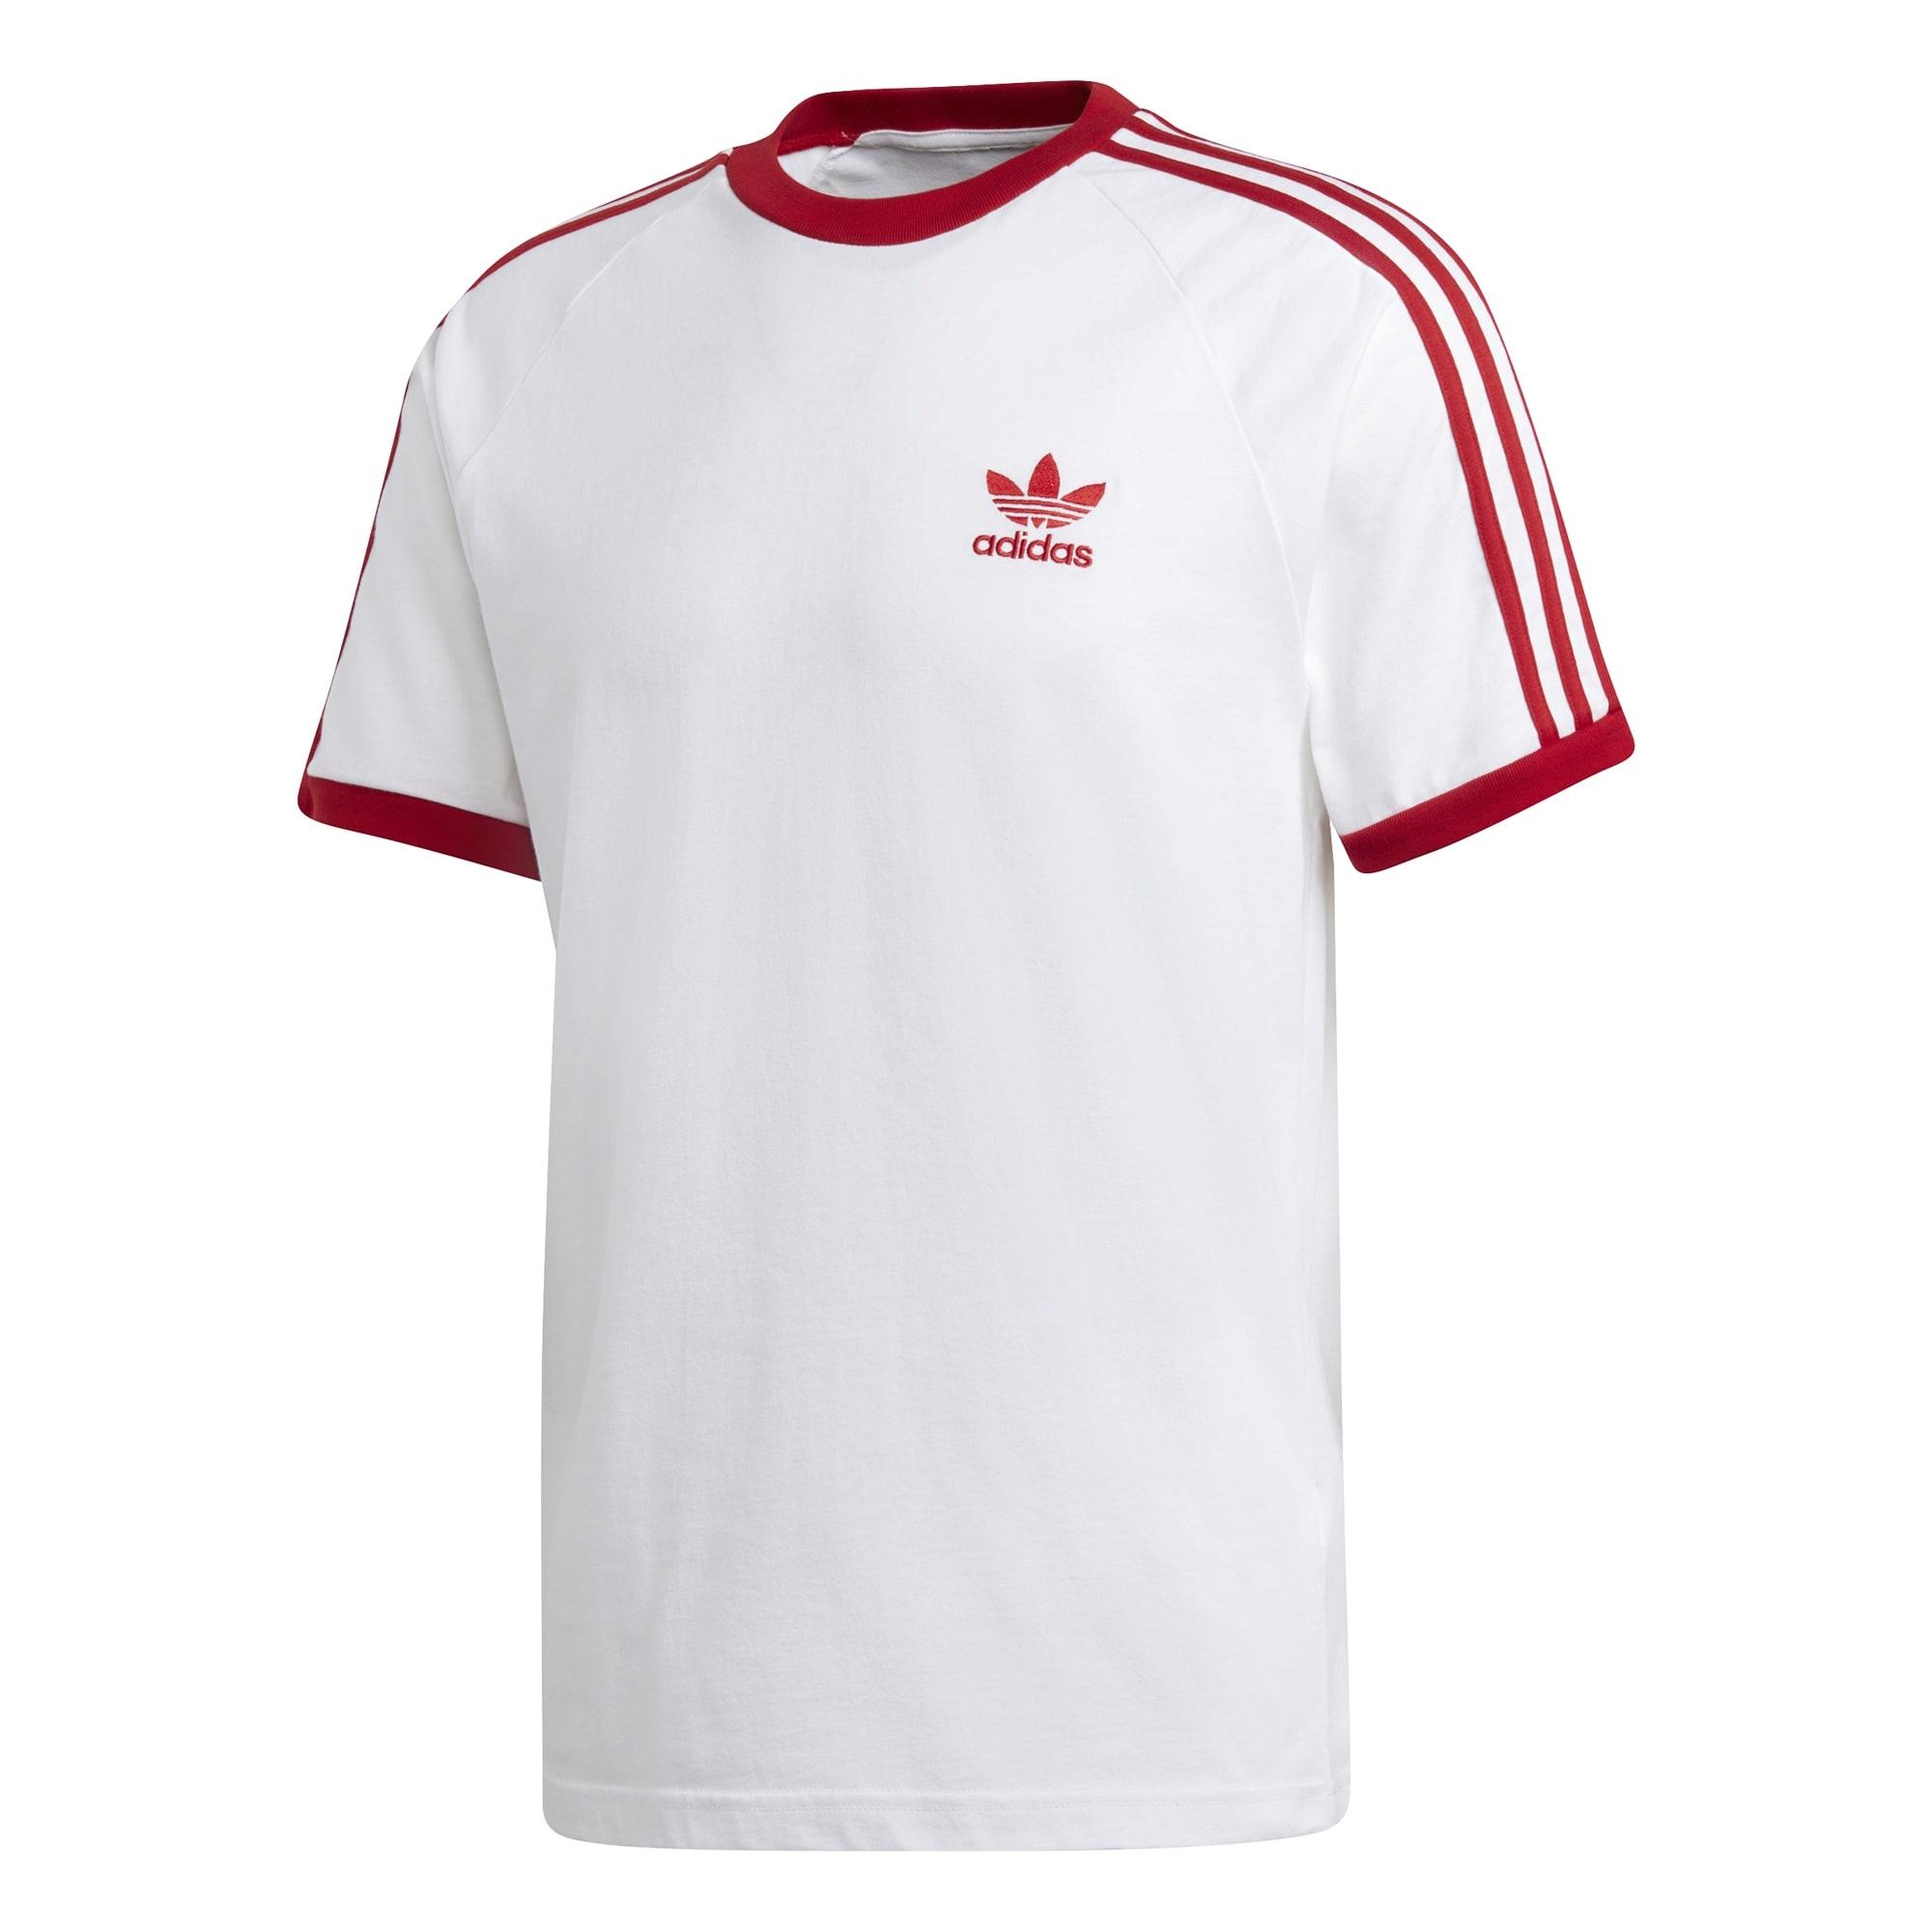 f56335af1 3 Liverpool Dy1533 Adidas Stripes Camiseta Originals Tee Hombre Deportes  npaqCZ